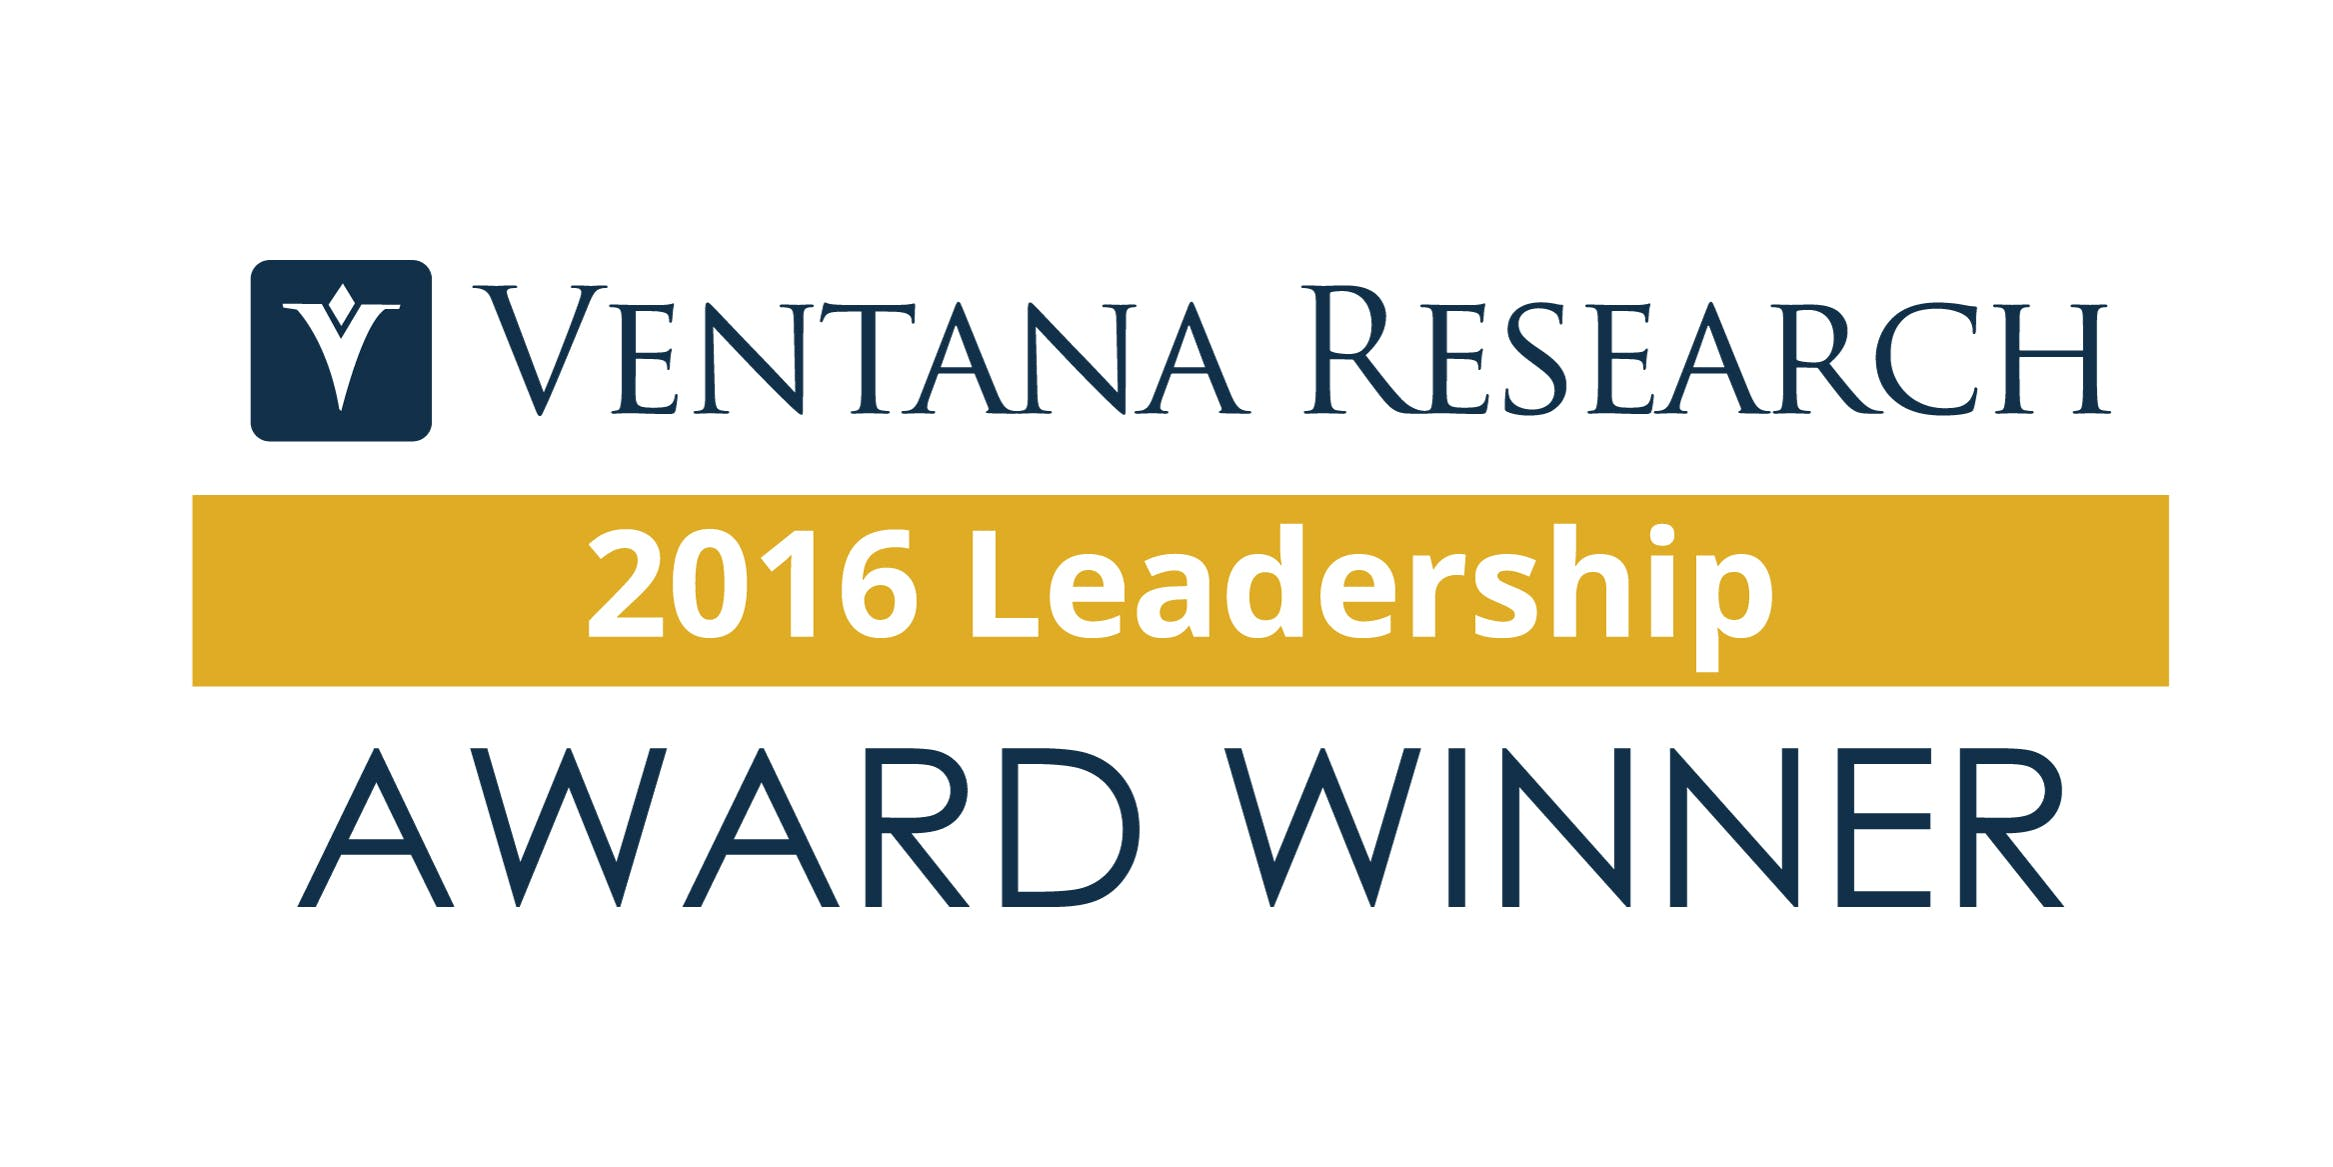 Ventana Research Leadership Award Image